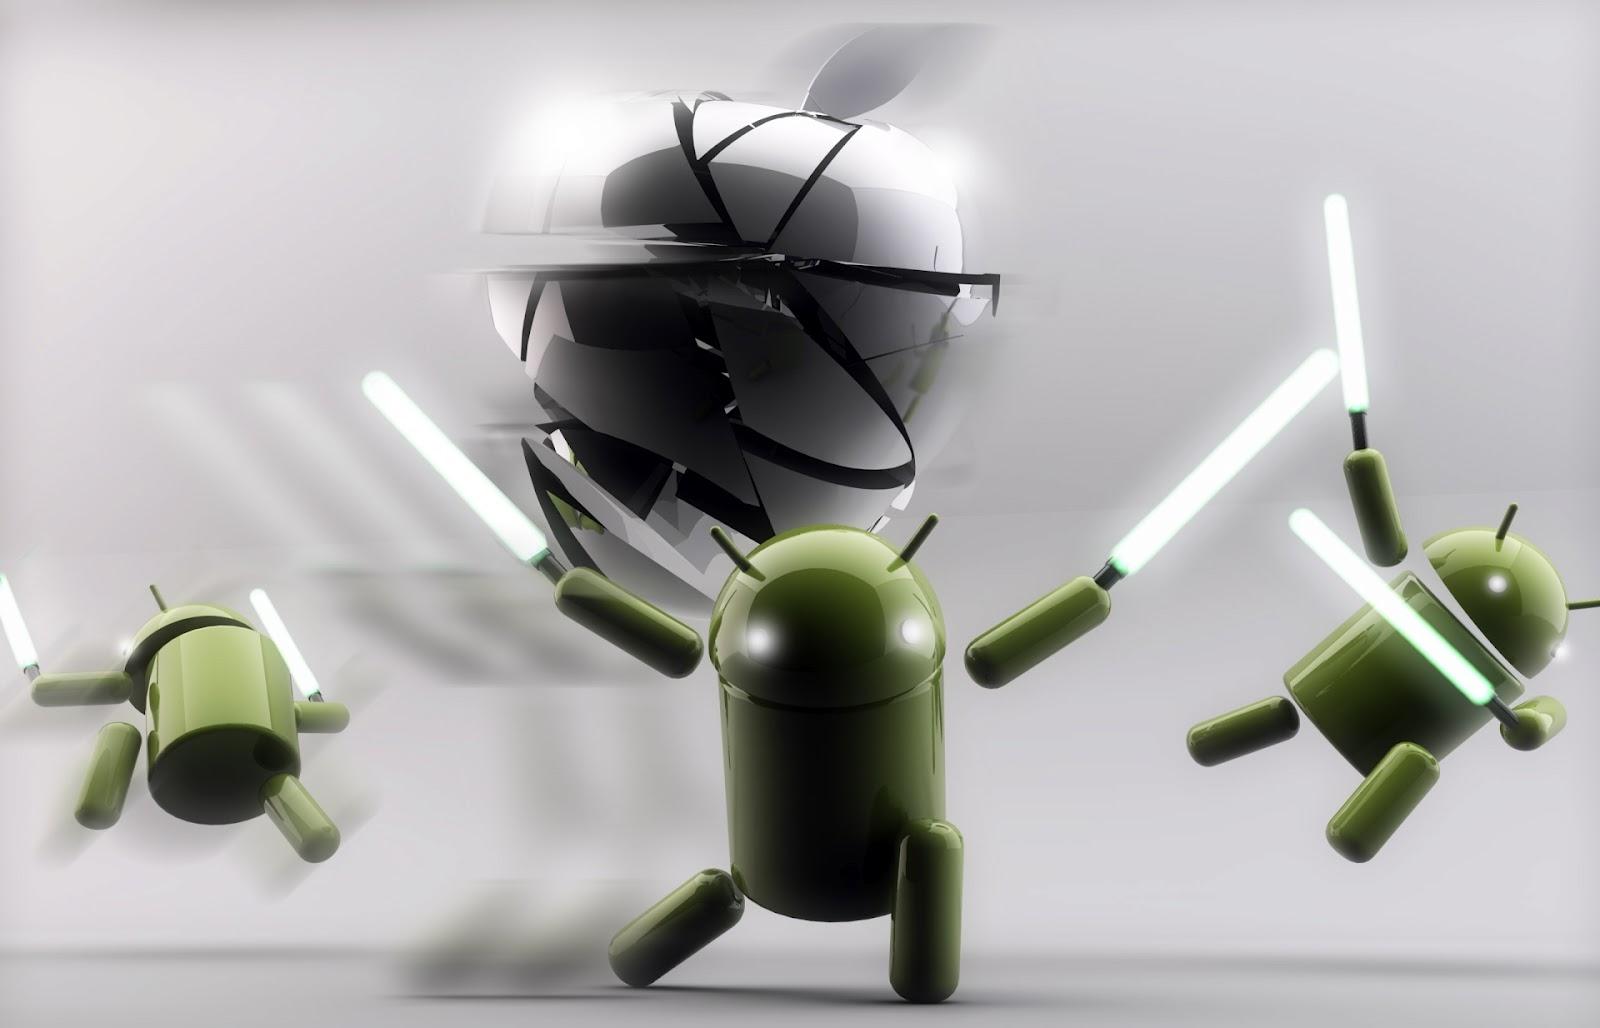 http://1.bp.blogspot.com/-siuzwxtwOlE/T1RwvpyTSWI/AAAAAAAACFo/h2vLyrYopk8/s1600/Android_Tablet_PC_Wallpaper_2.jpg